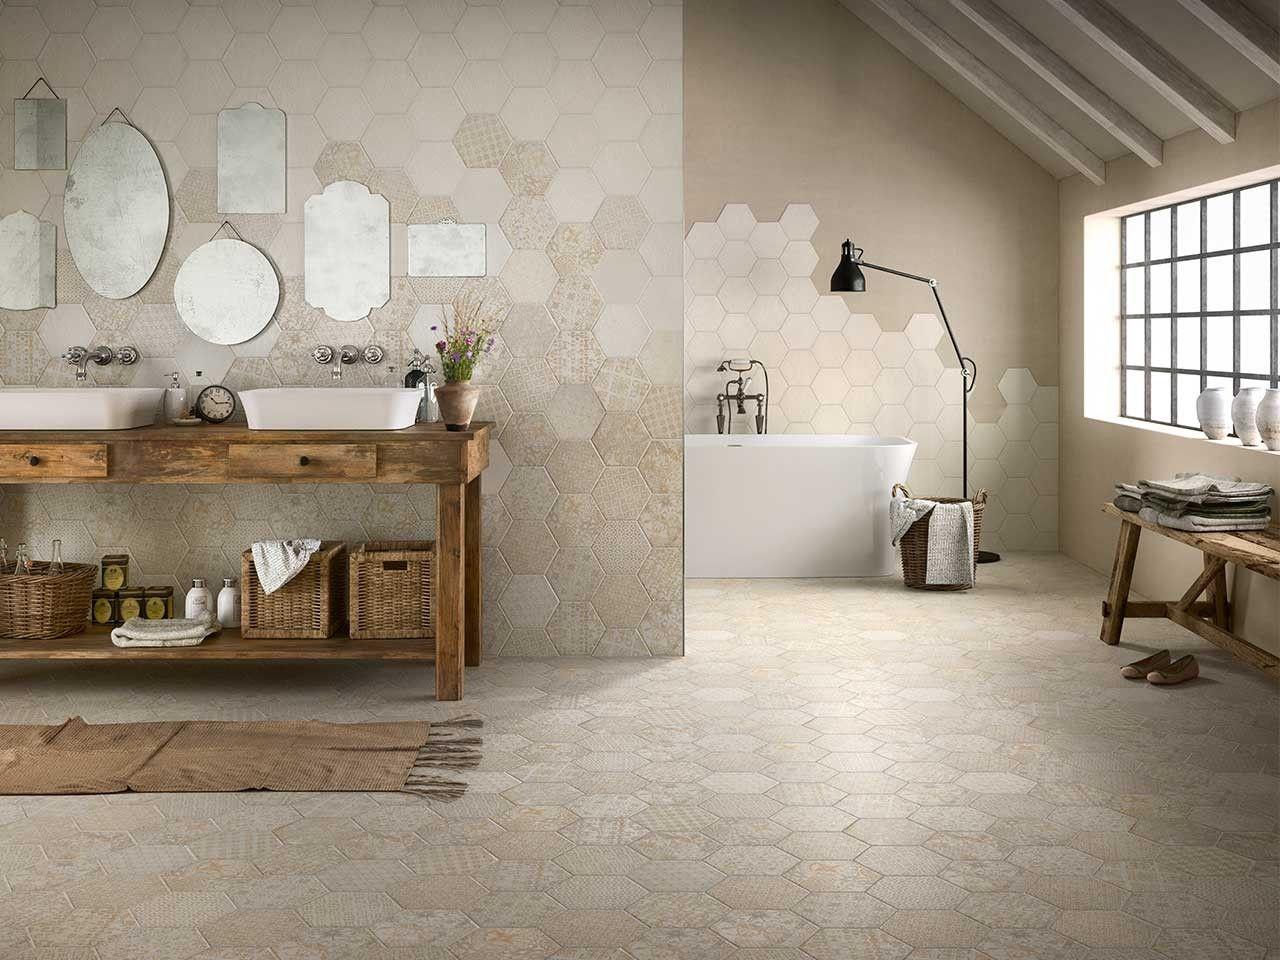 Mosaico bagno iperceramica piastrelle bagno a mosaico foto